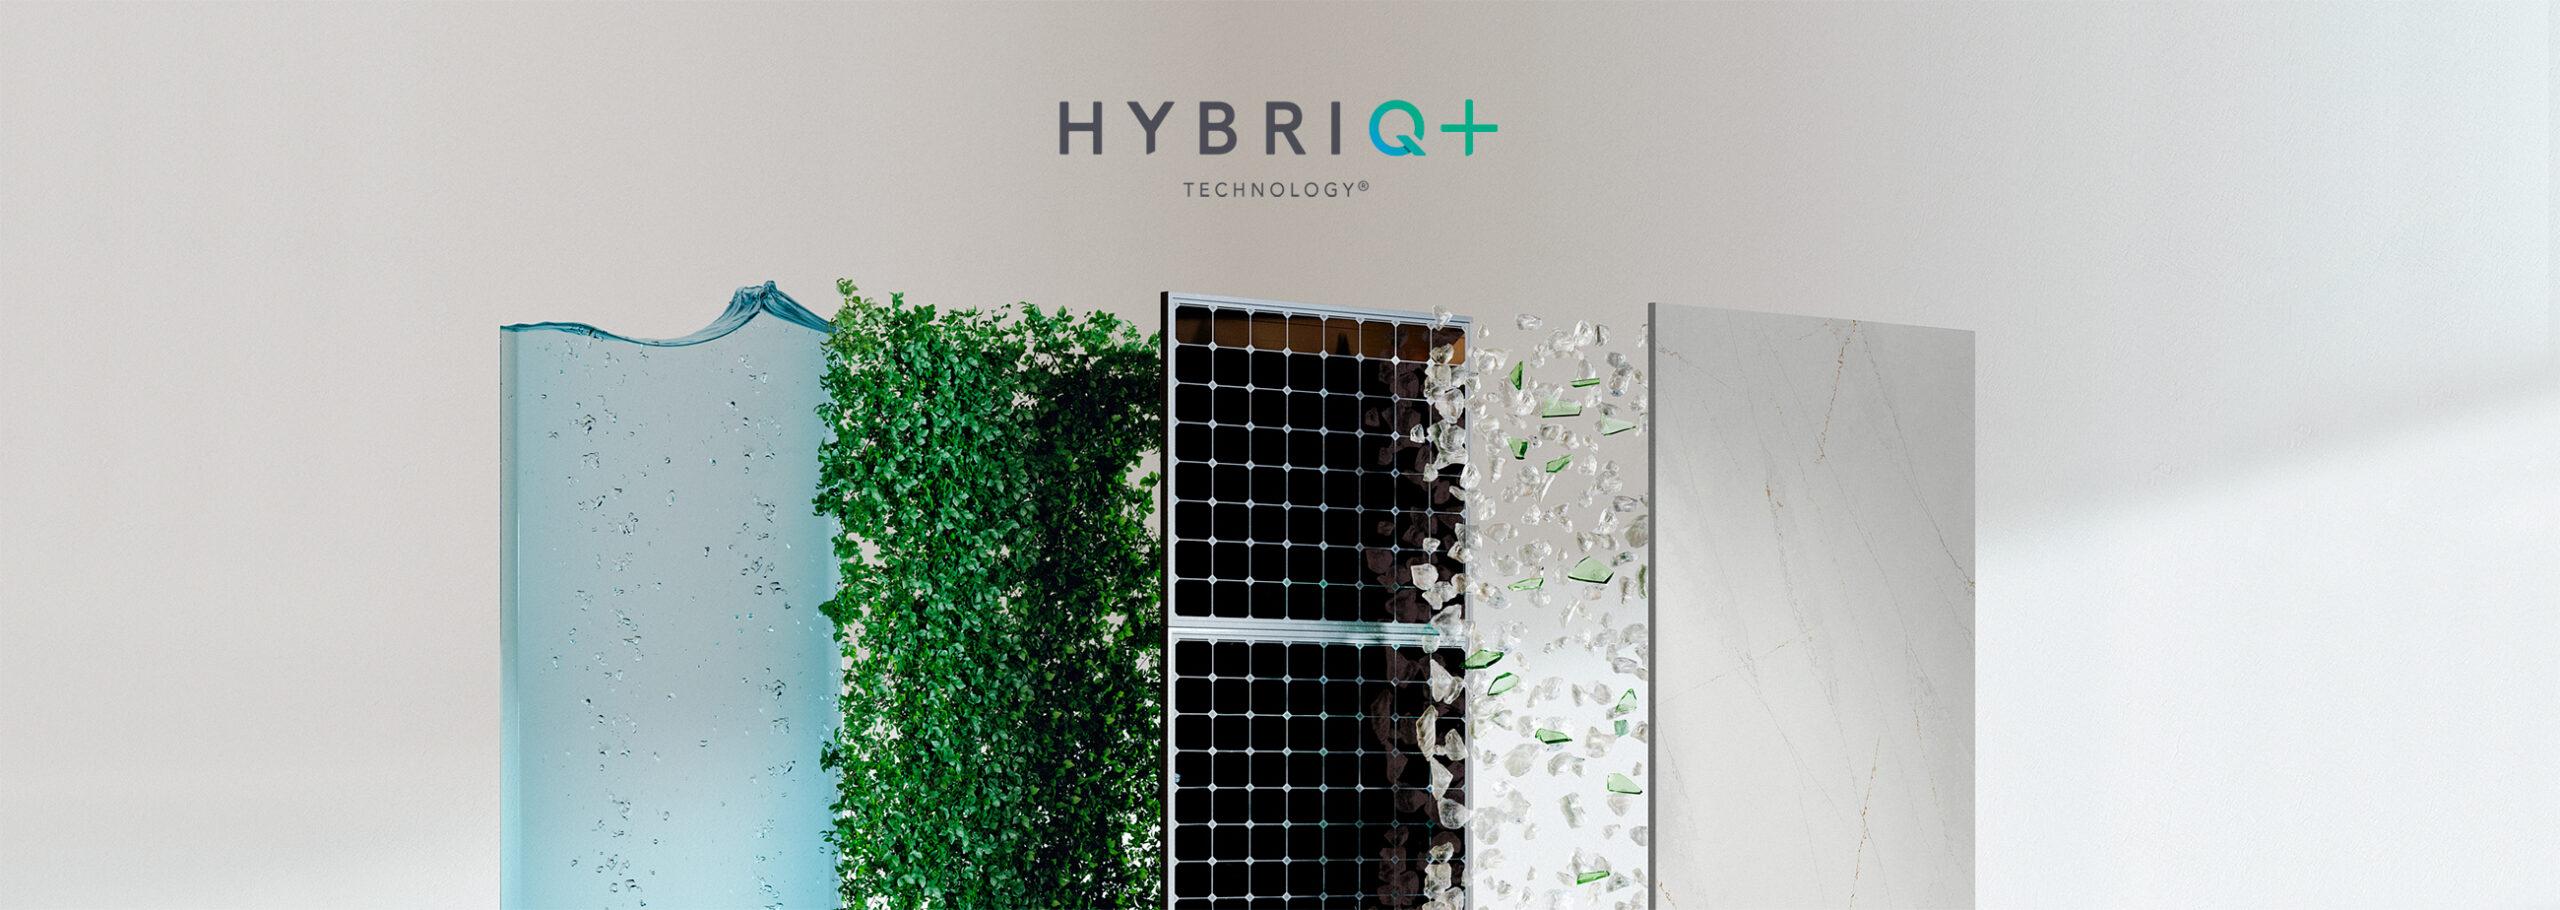 Image of Concepto Tablas Hybriq scaled in Wat is Silestone® - Cosentino